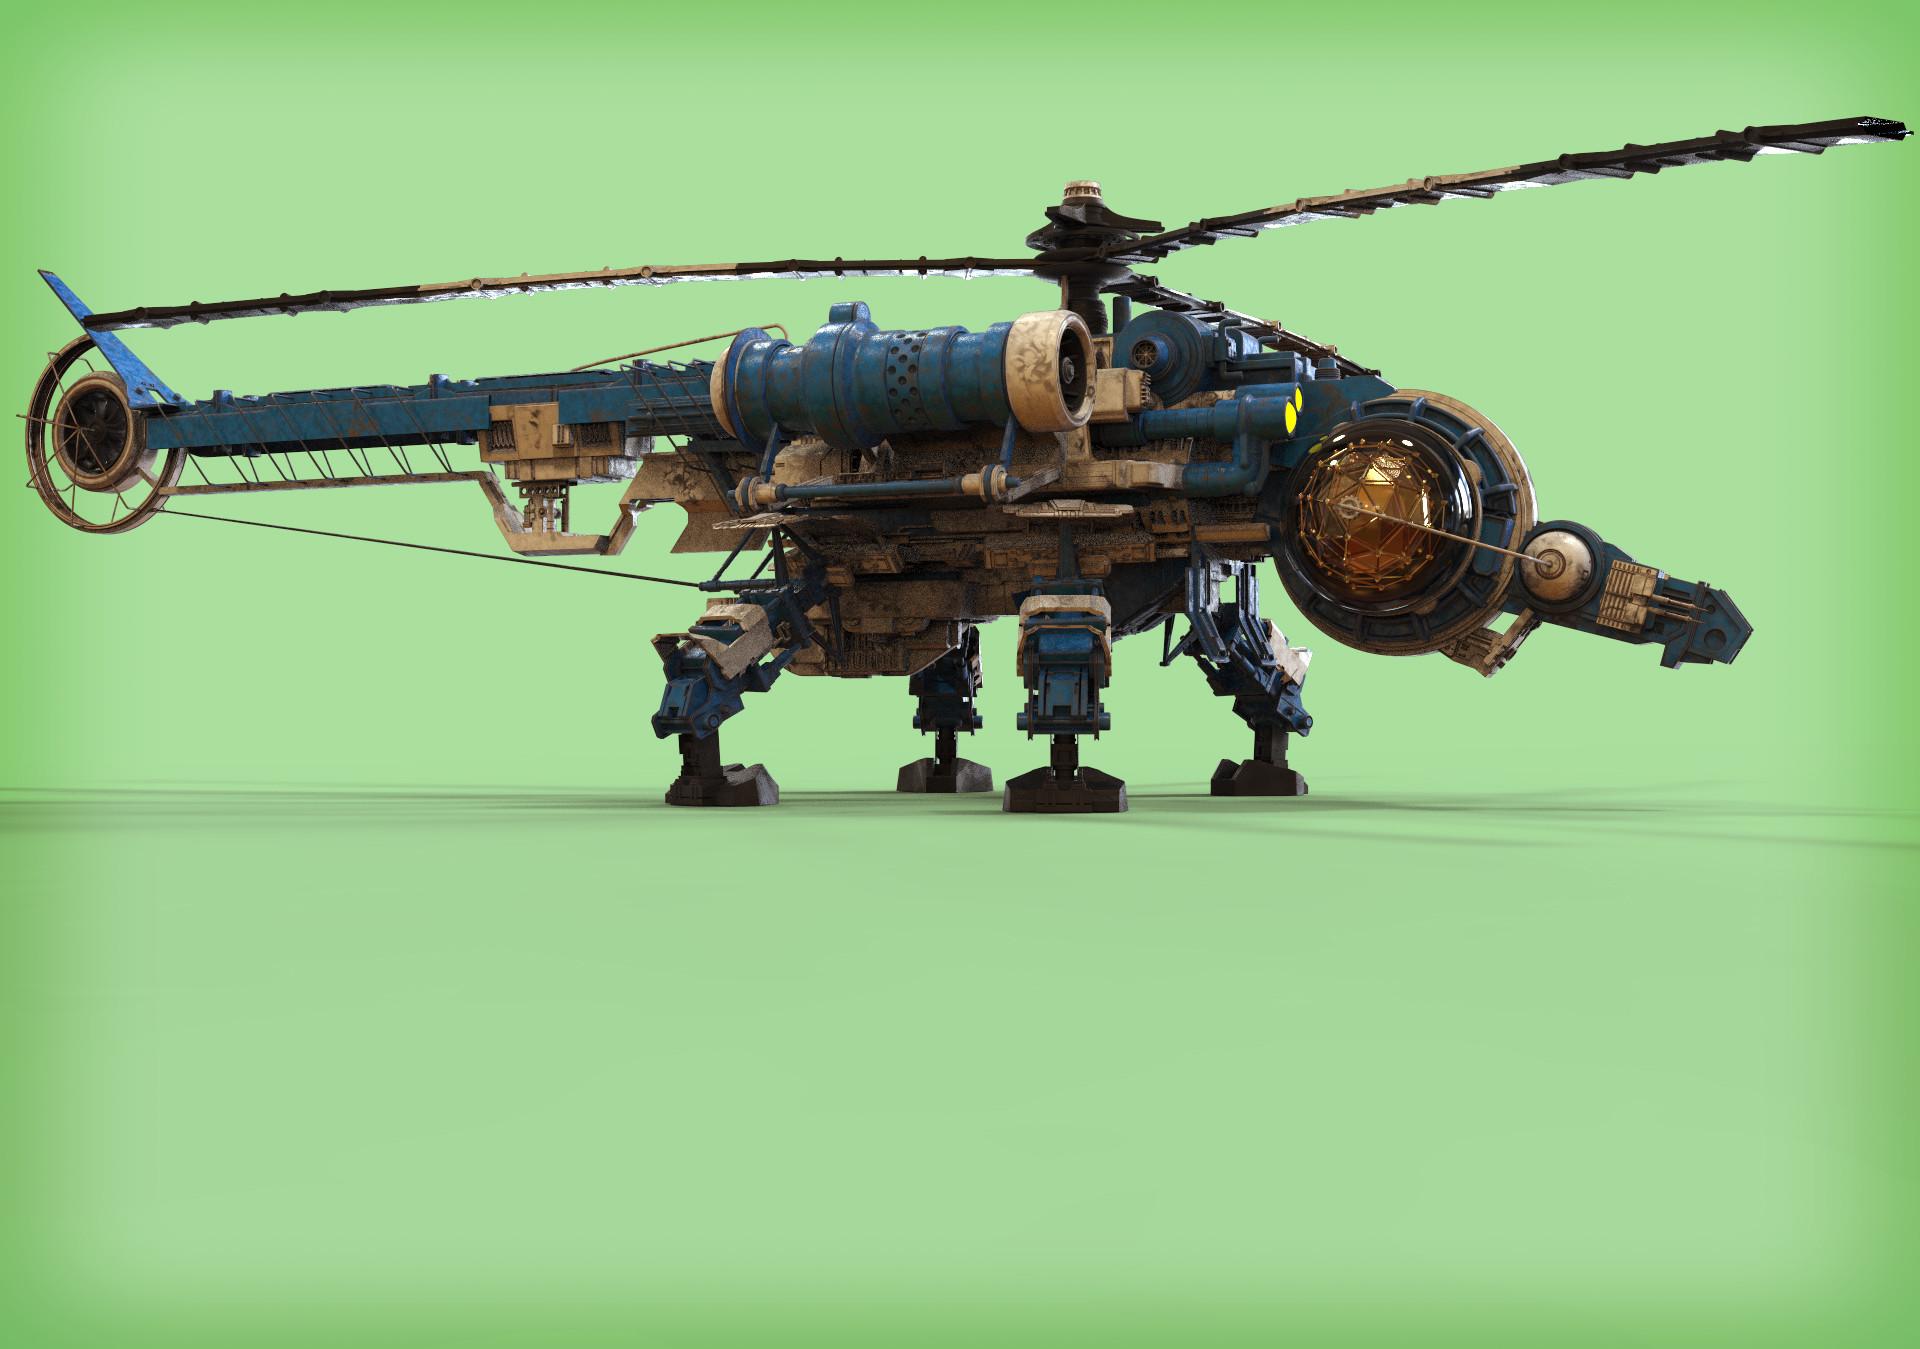 Ben nicholas bughelicopter 07